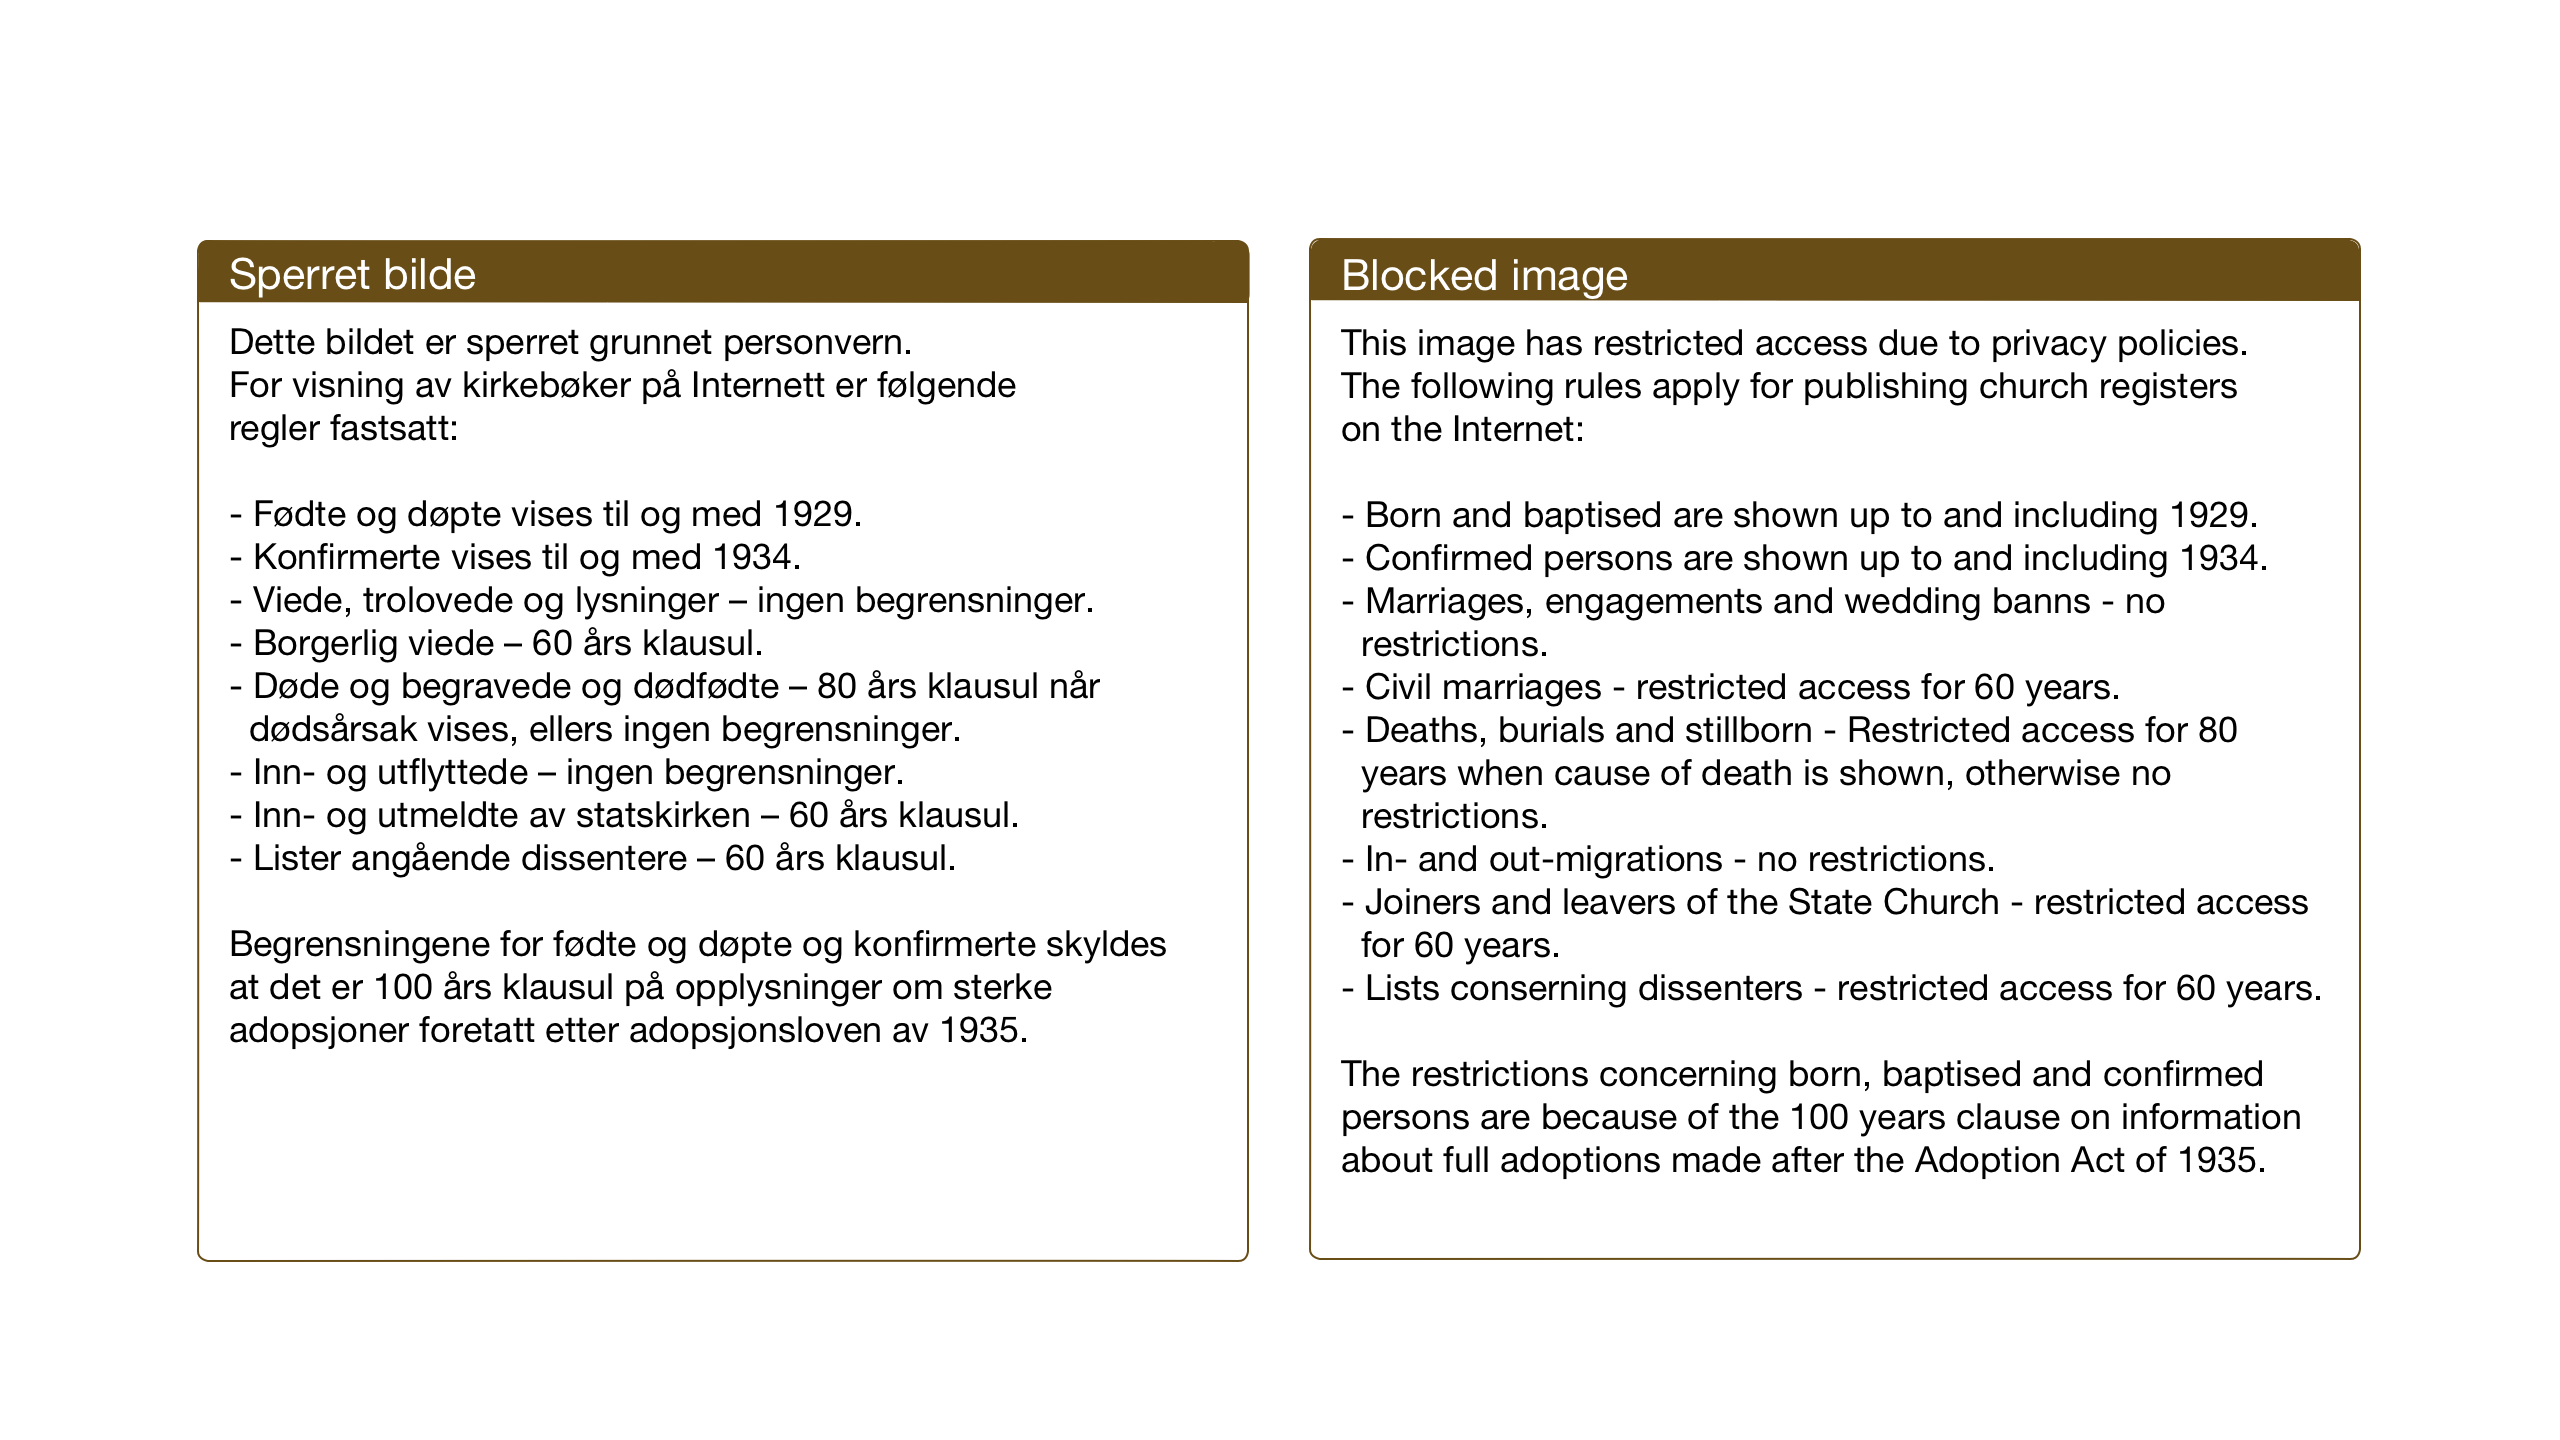 SAH, Vardal prestekontor, H/Ha/Haa/L0018: Ministerialbok nr. 18, 1930-1945, s. 266